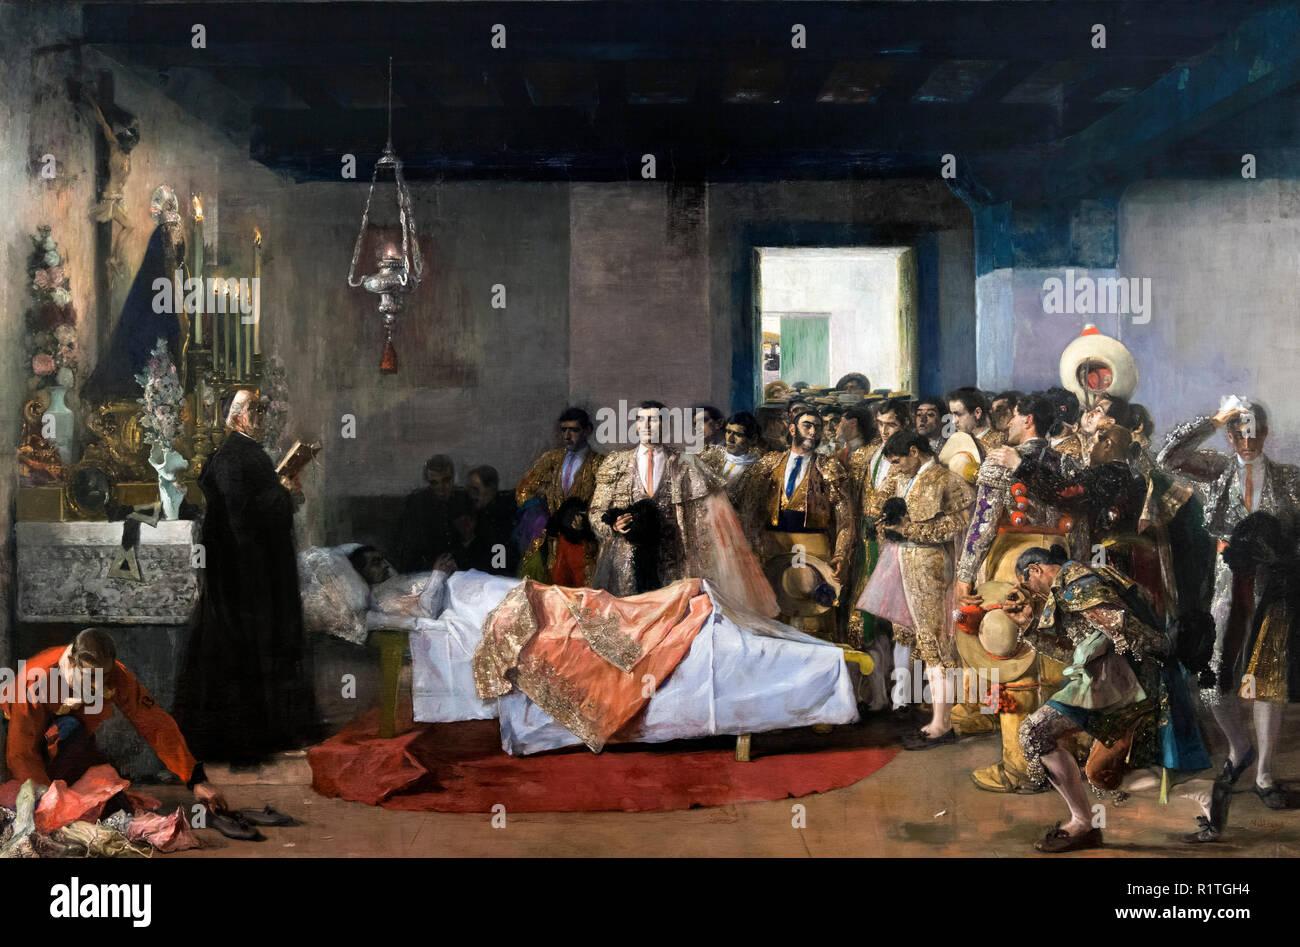 La muerte Del Maestro (Tod des Meisters) von Jose Villegas Cordero (1844-1921), c 1913 Stockbild